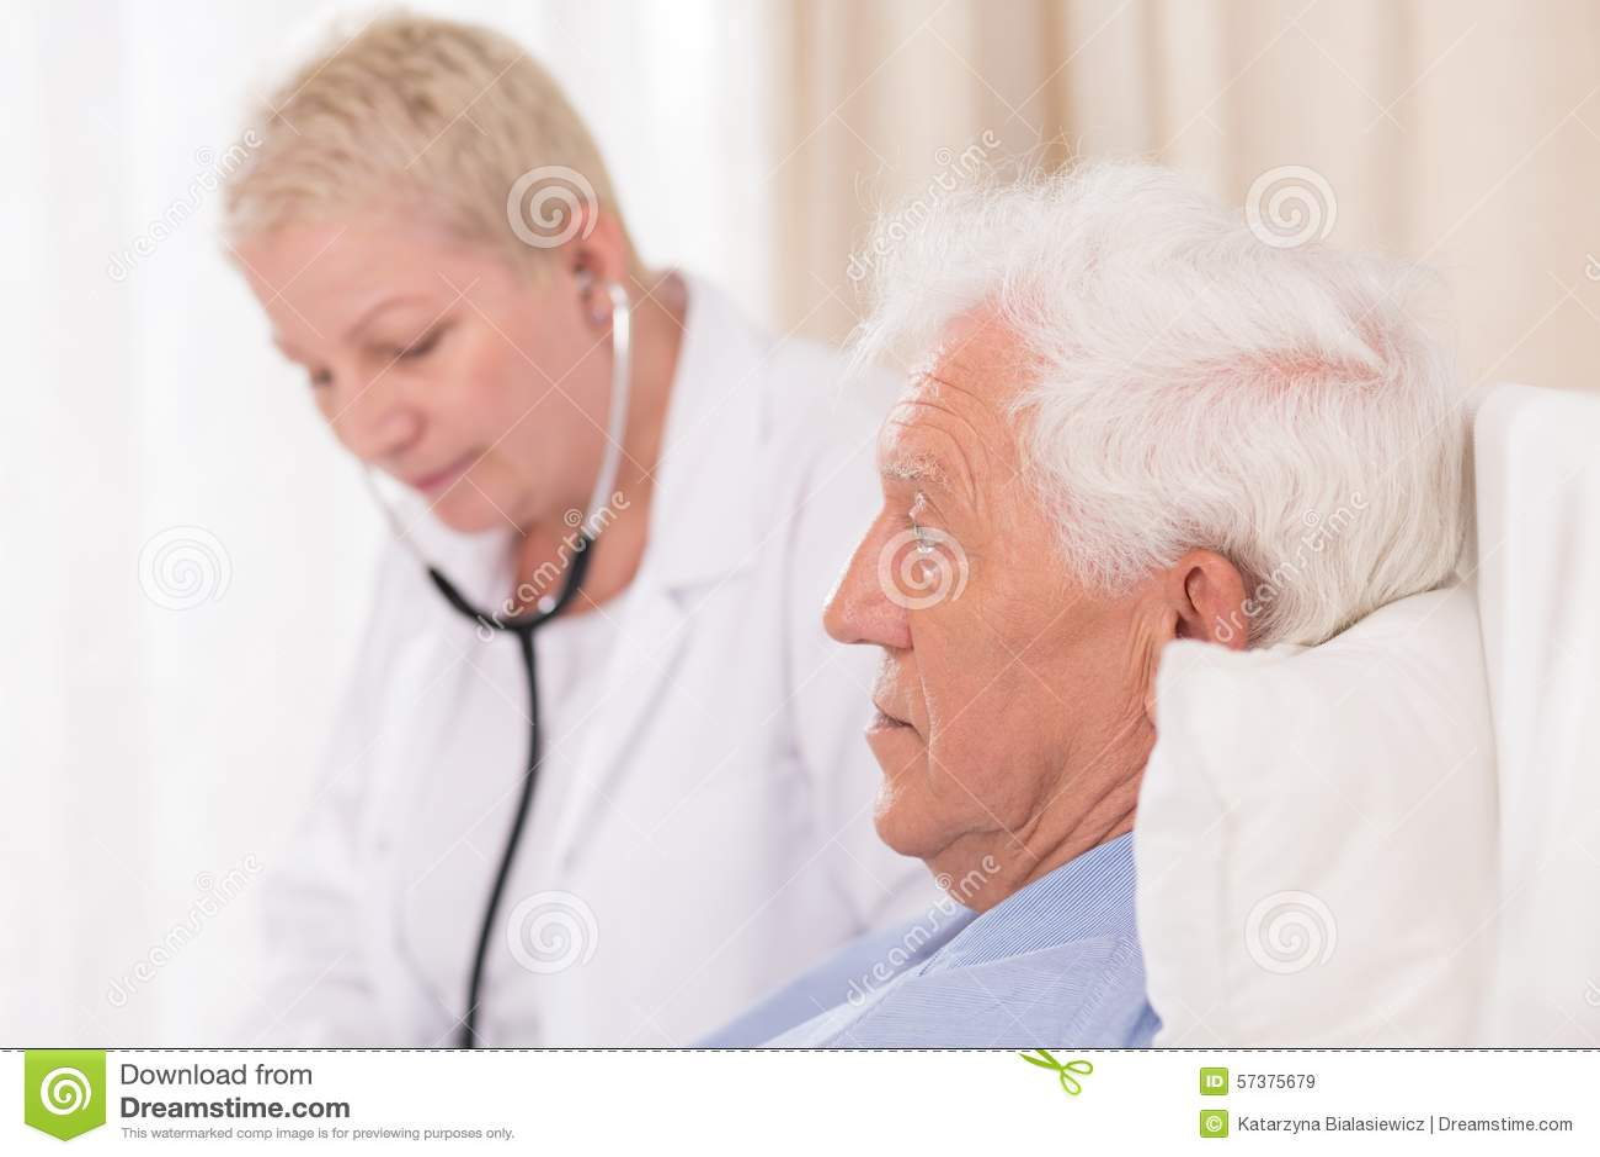 De Patiënt van artsenwith stethoscope examining